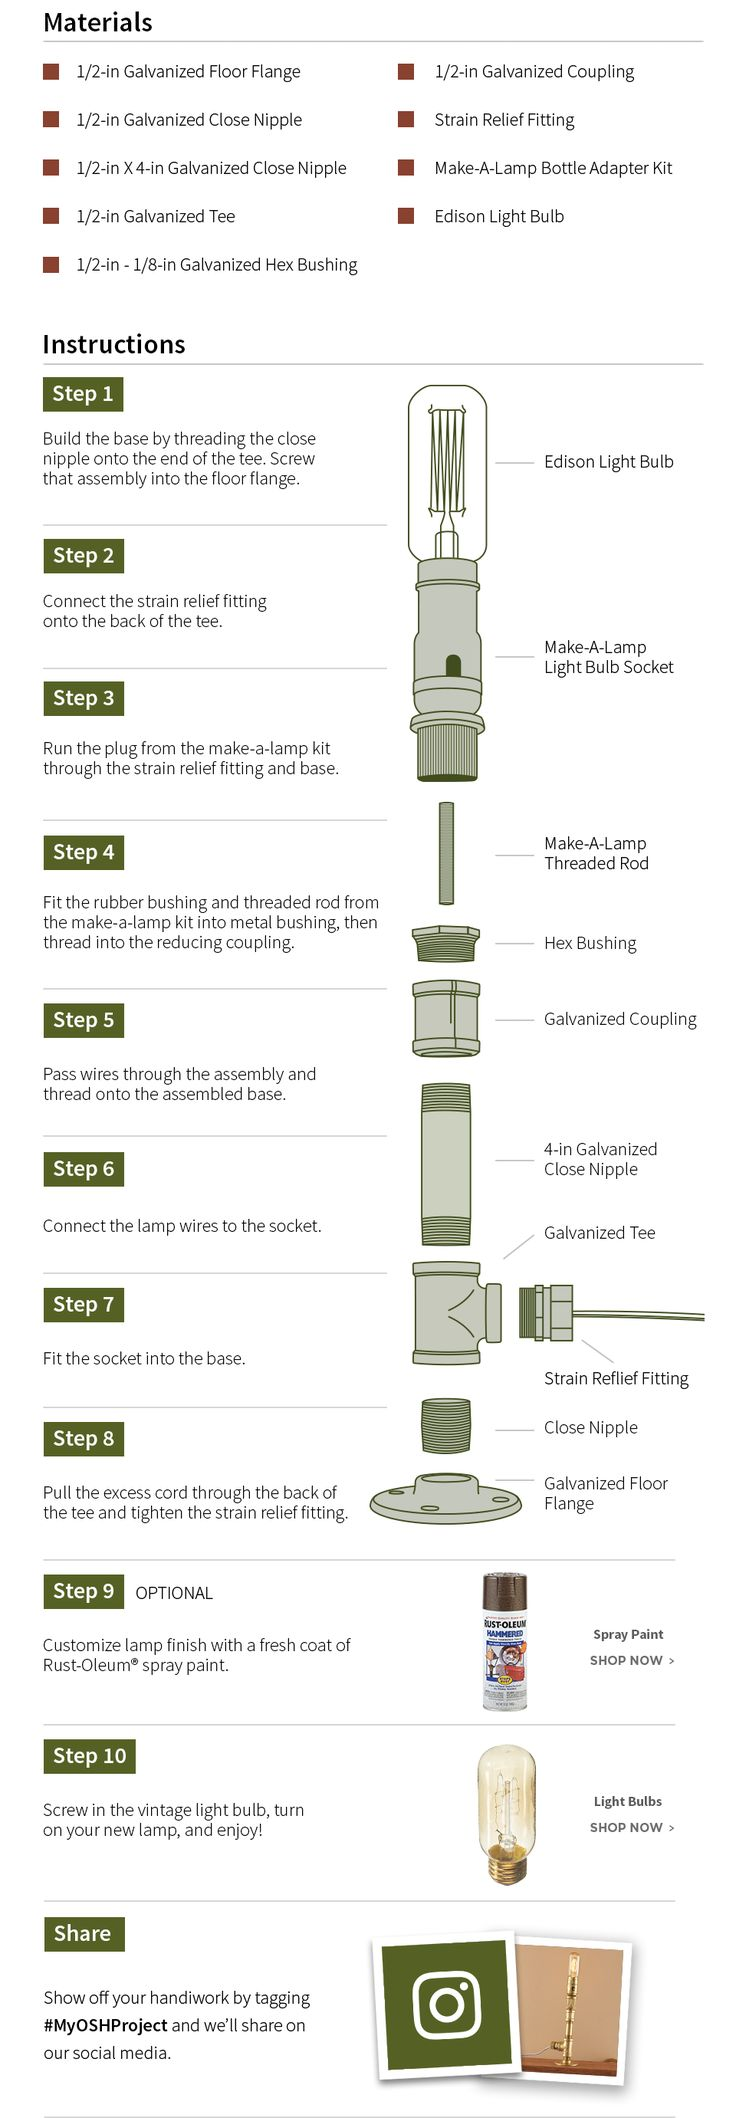 Materials and Instructions Robot lamp Make a lamp Diy